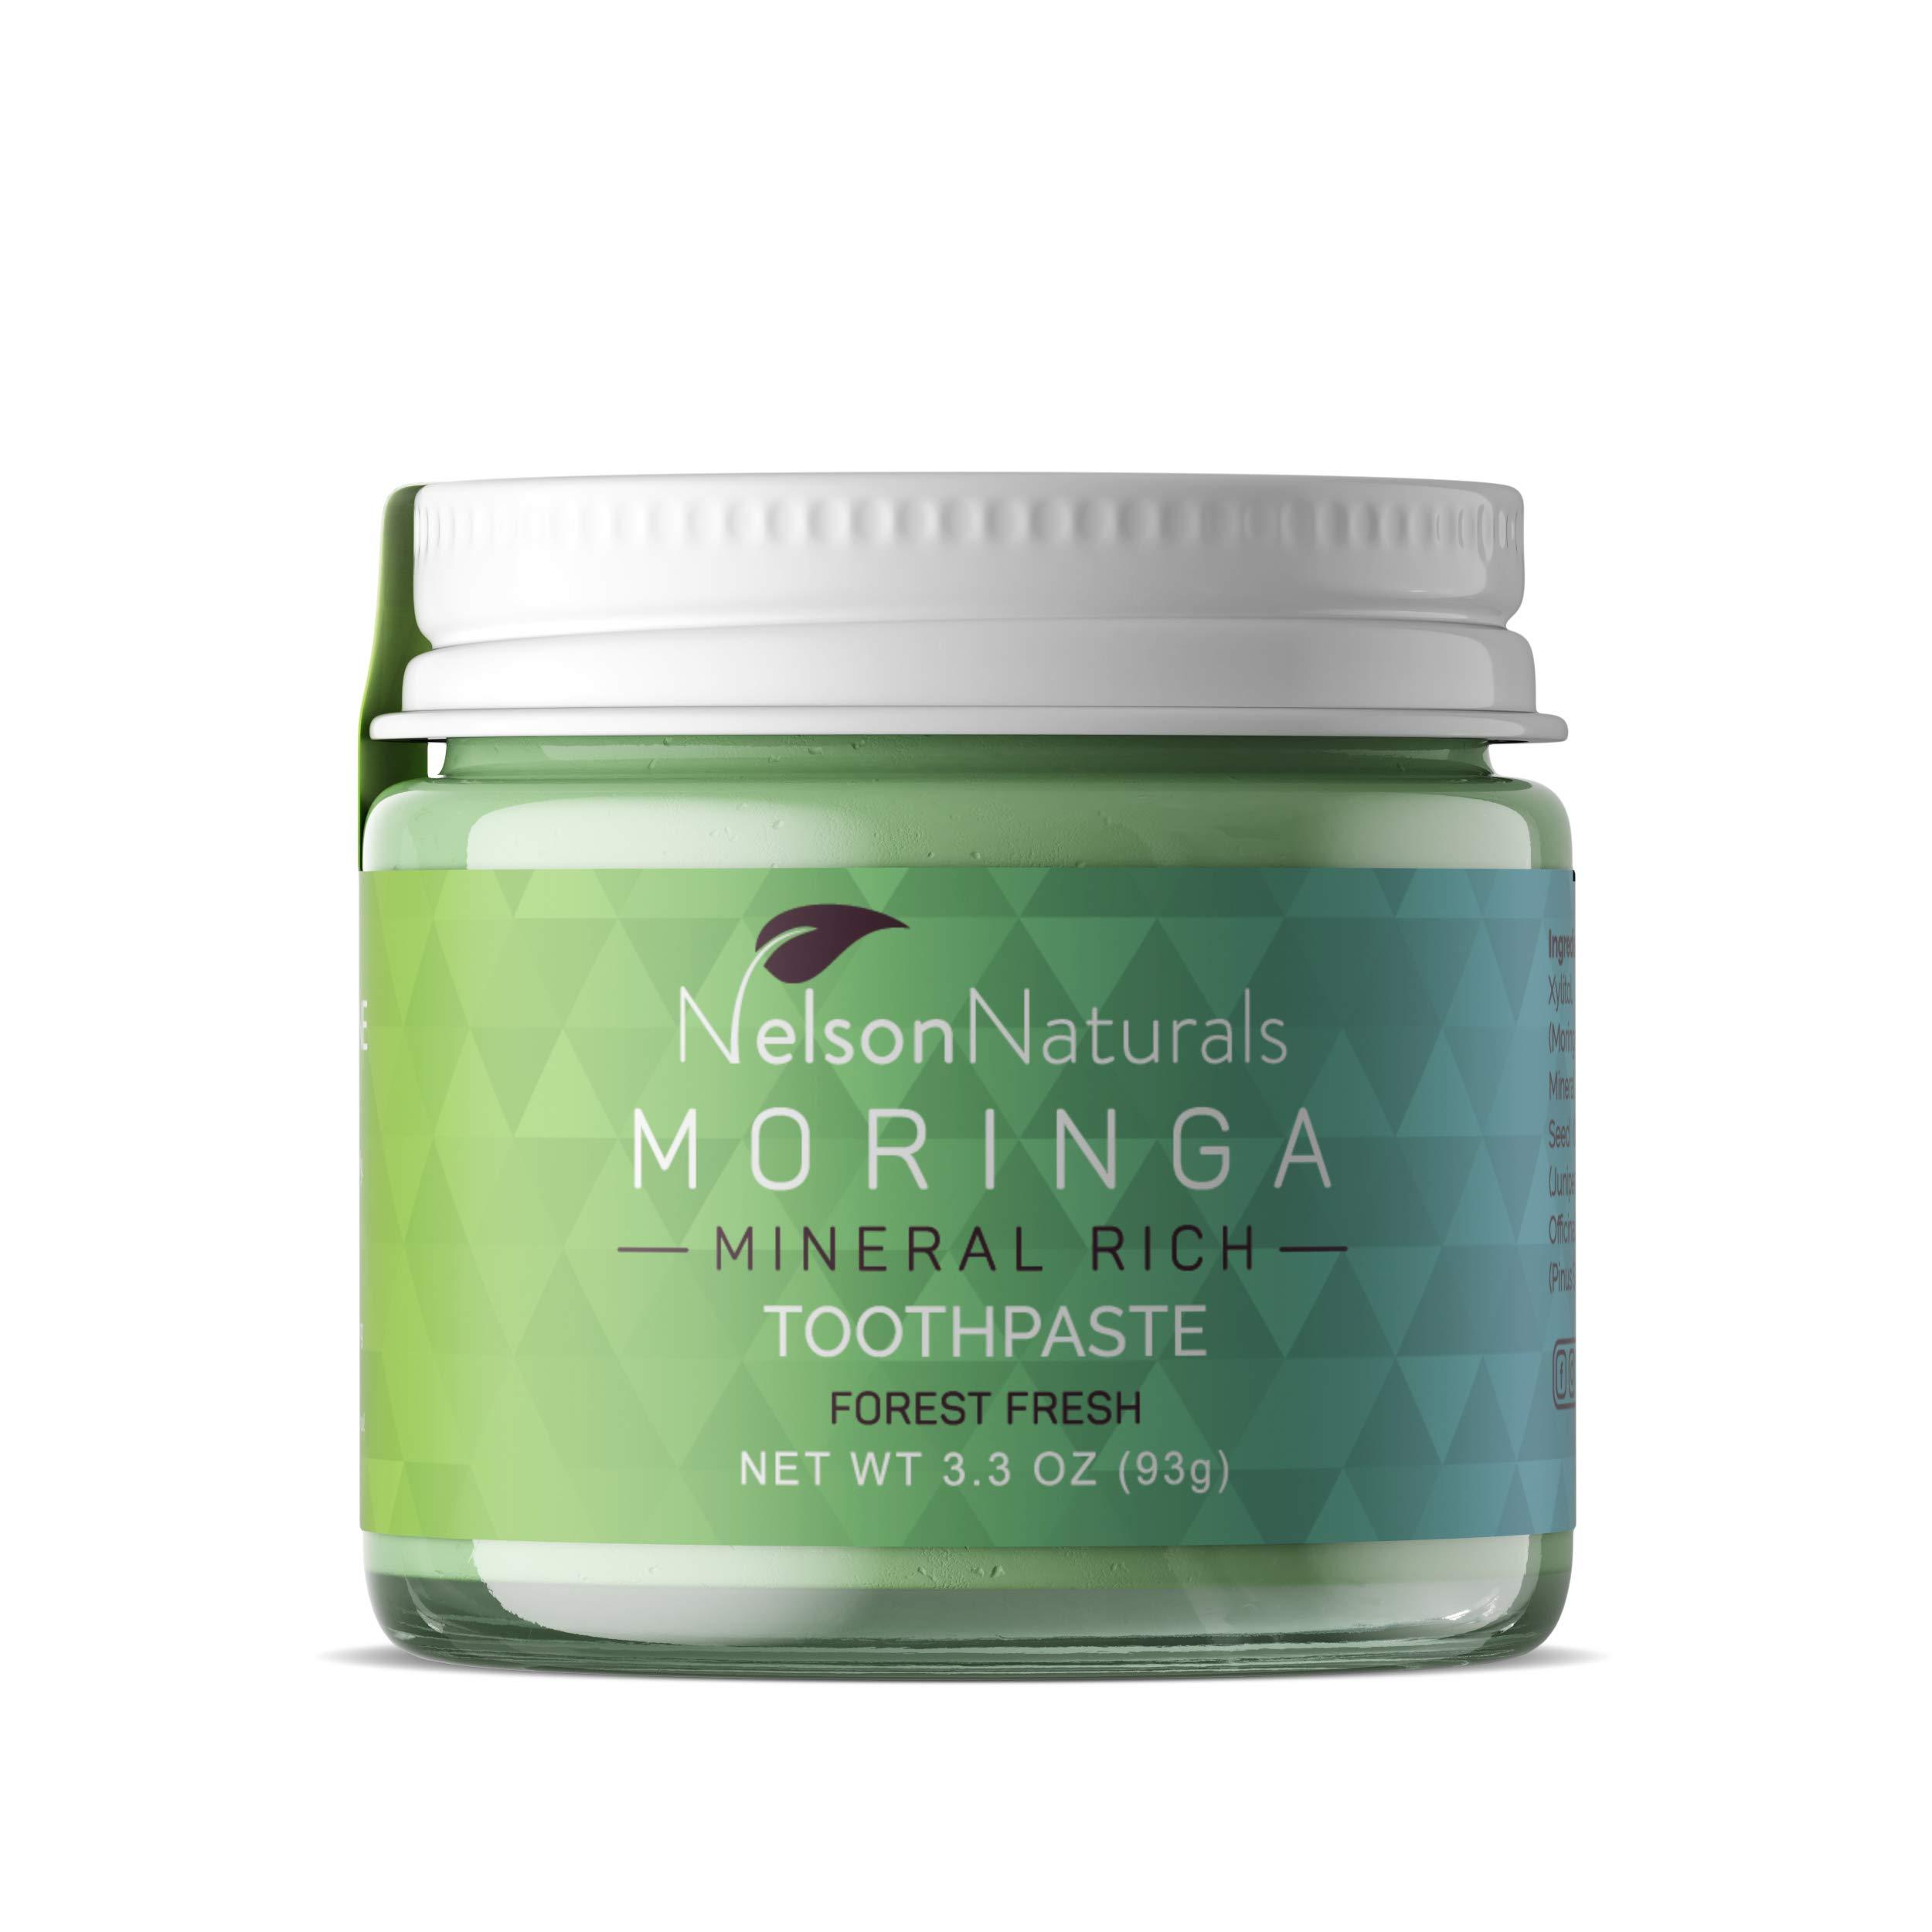 Moringa Mineral Rich Fluoride Free Toothpaste 2 oz